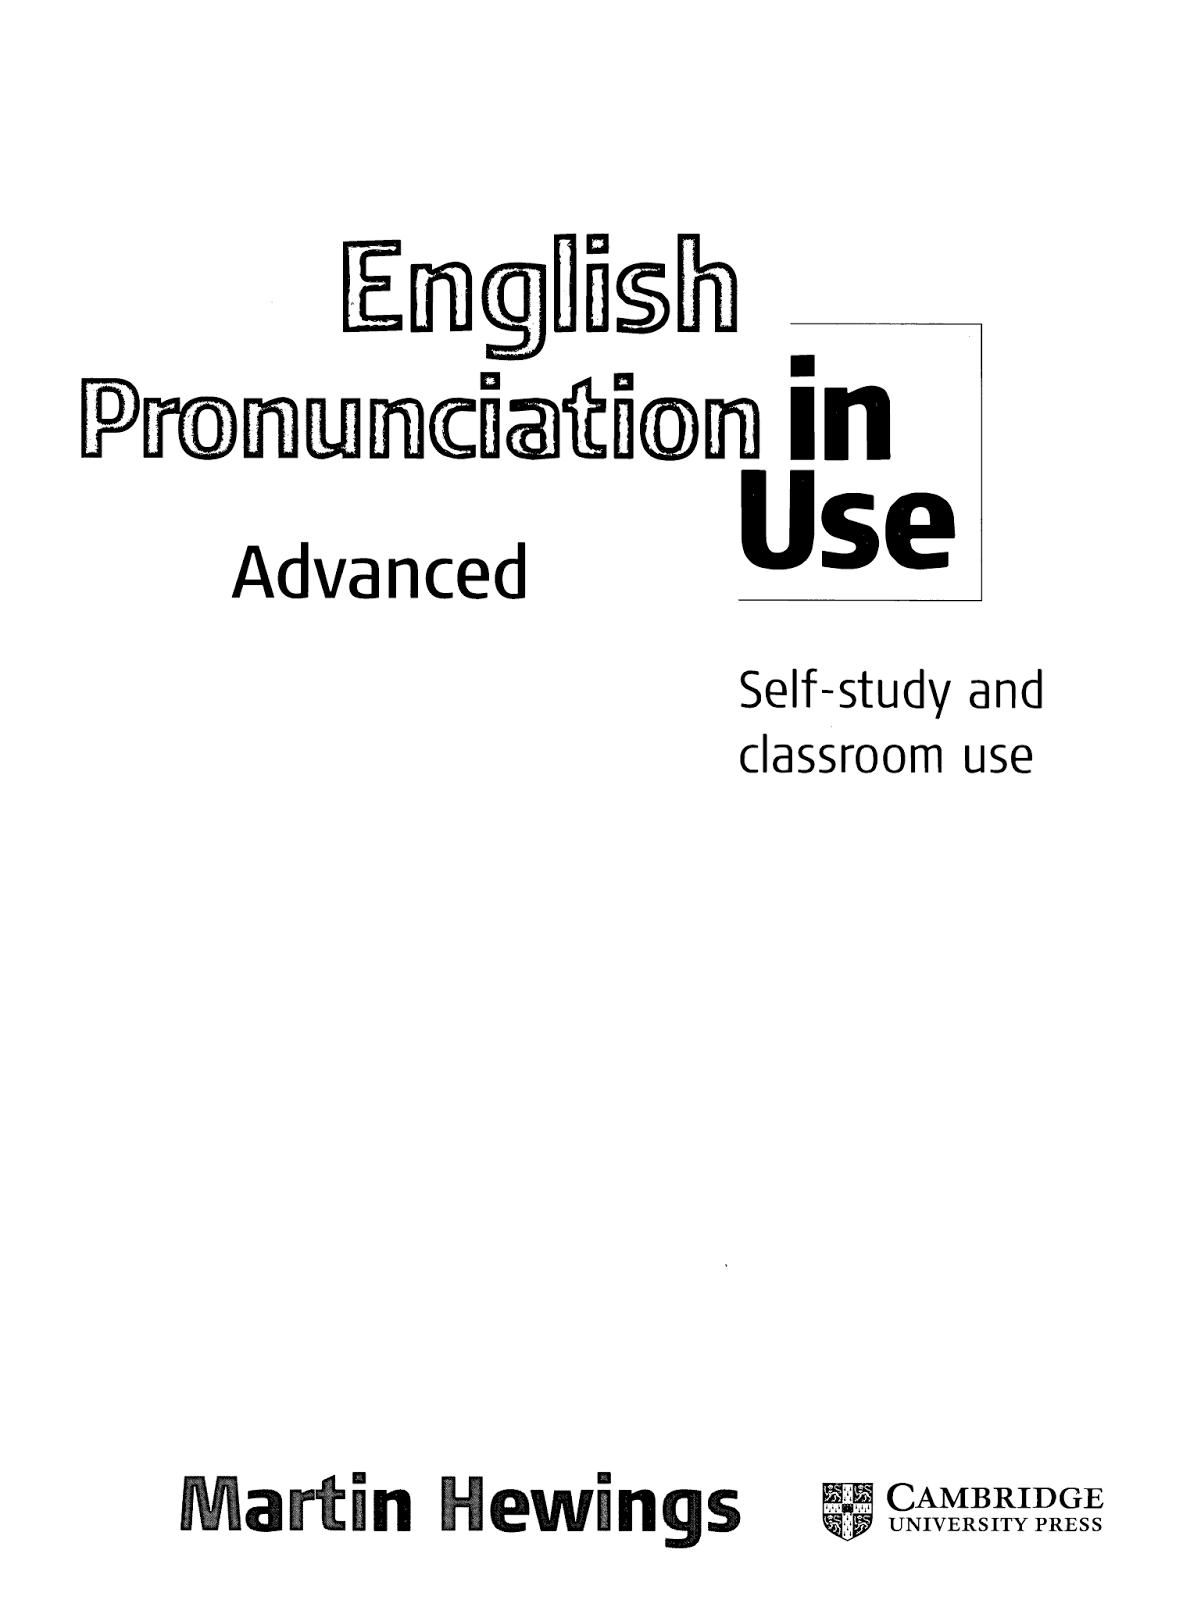 English Pronunciation in Use Advance